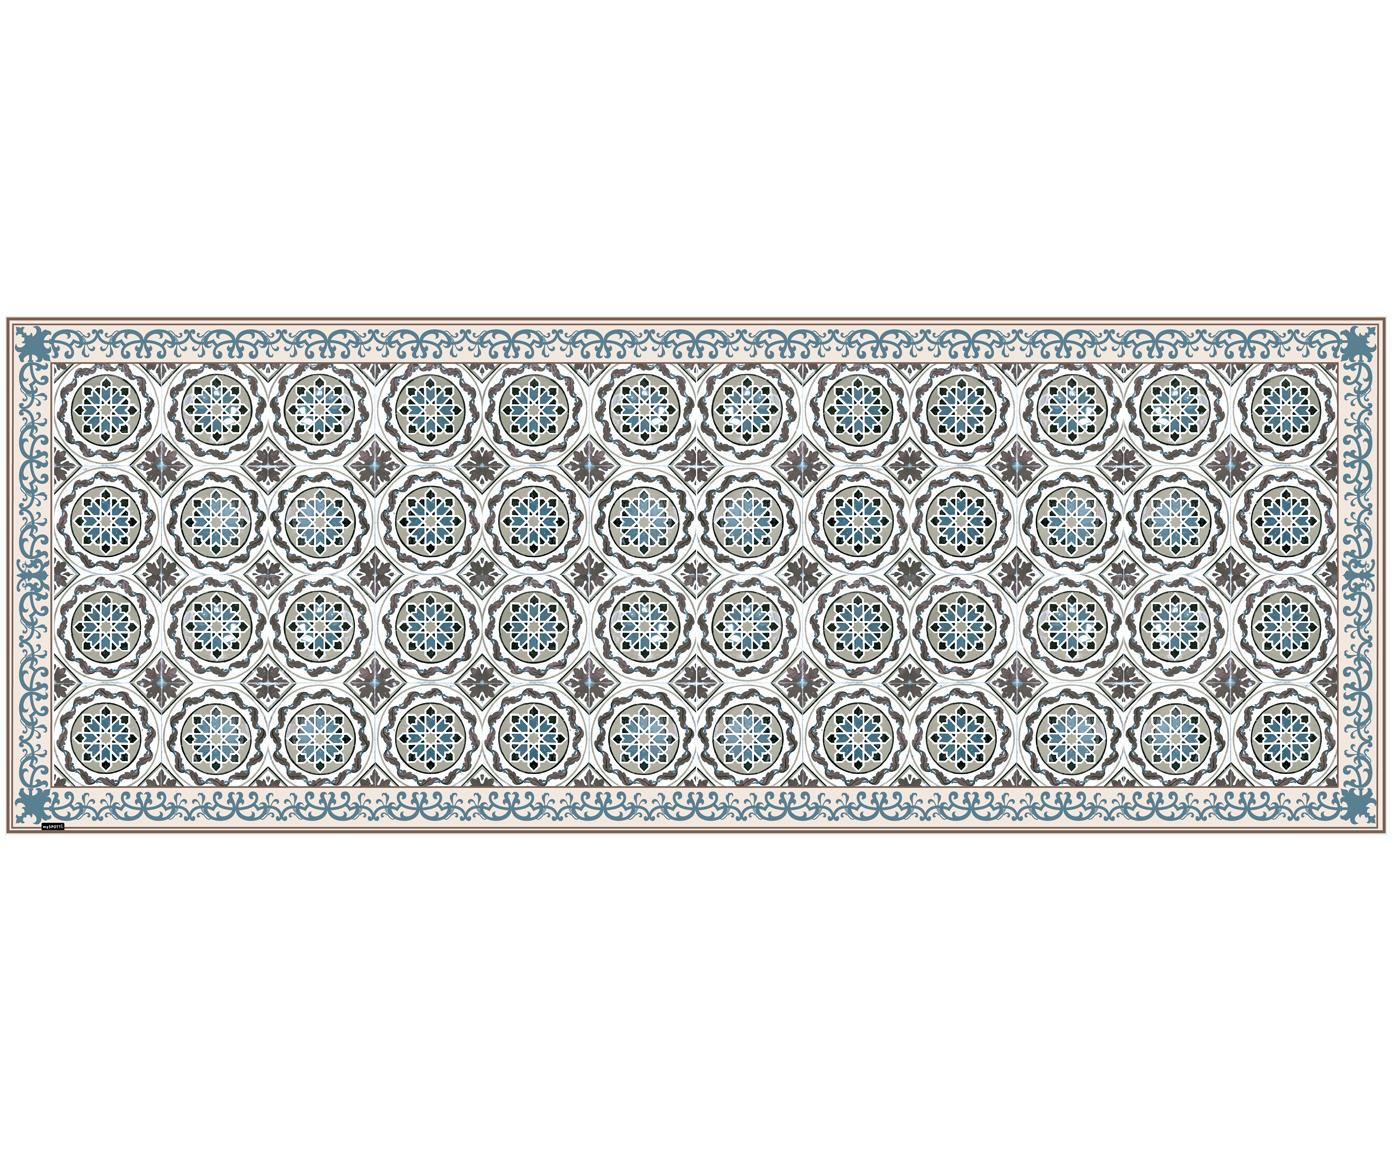 Vinyl-Bodenmatte Selina, Vinyl, recycelbar, Beige, Braun, Blau, 68 x 180 cm